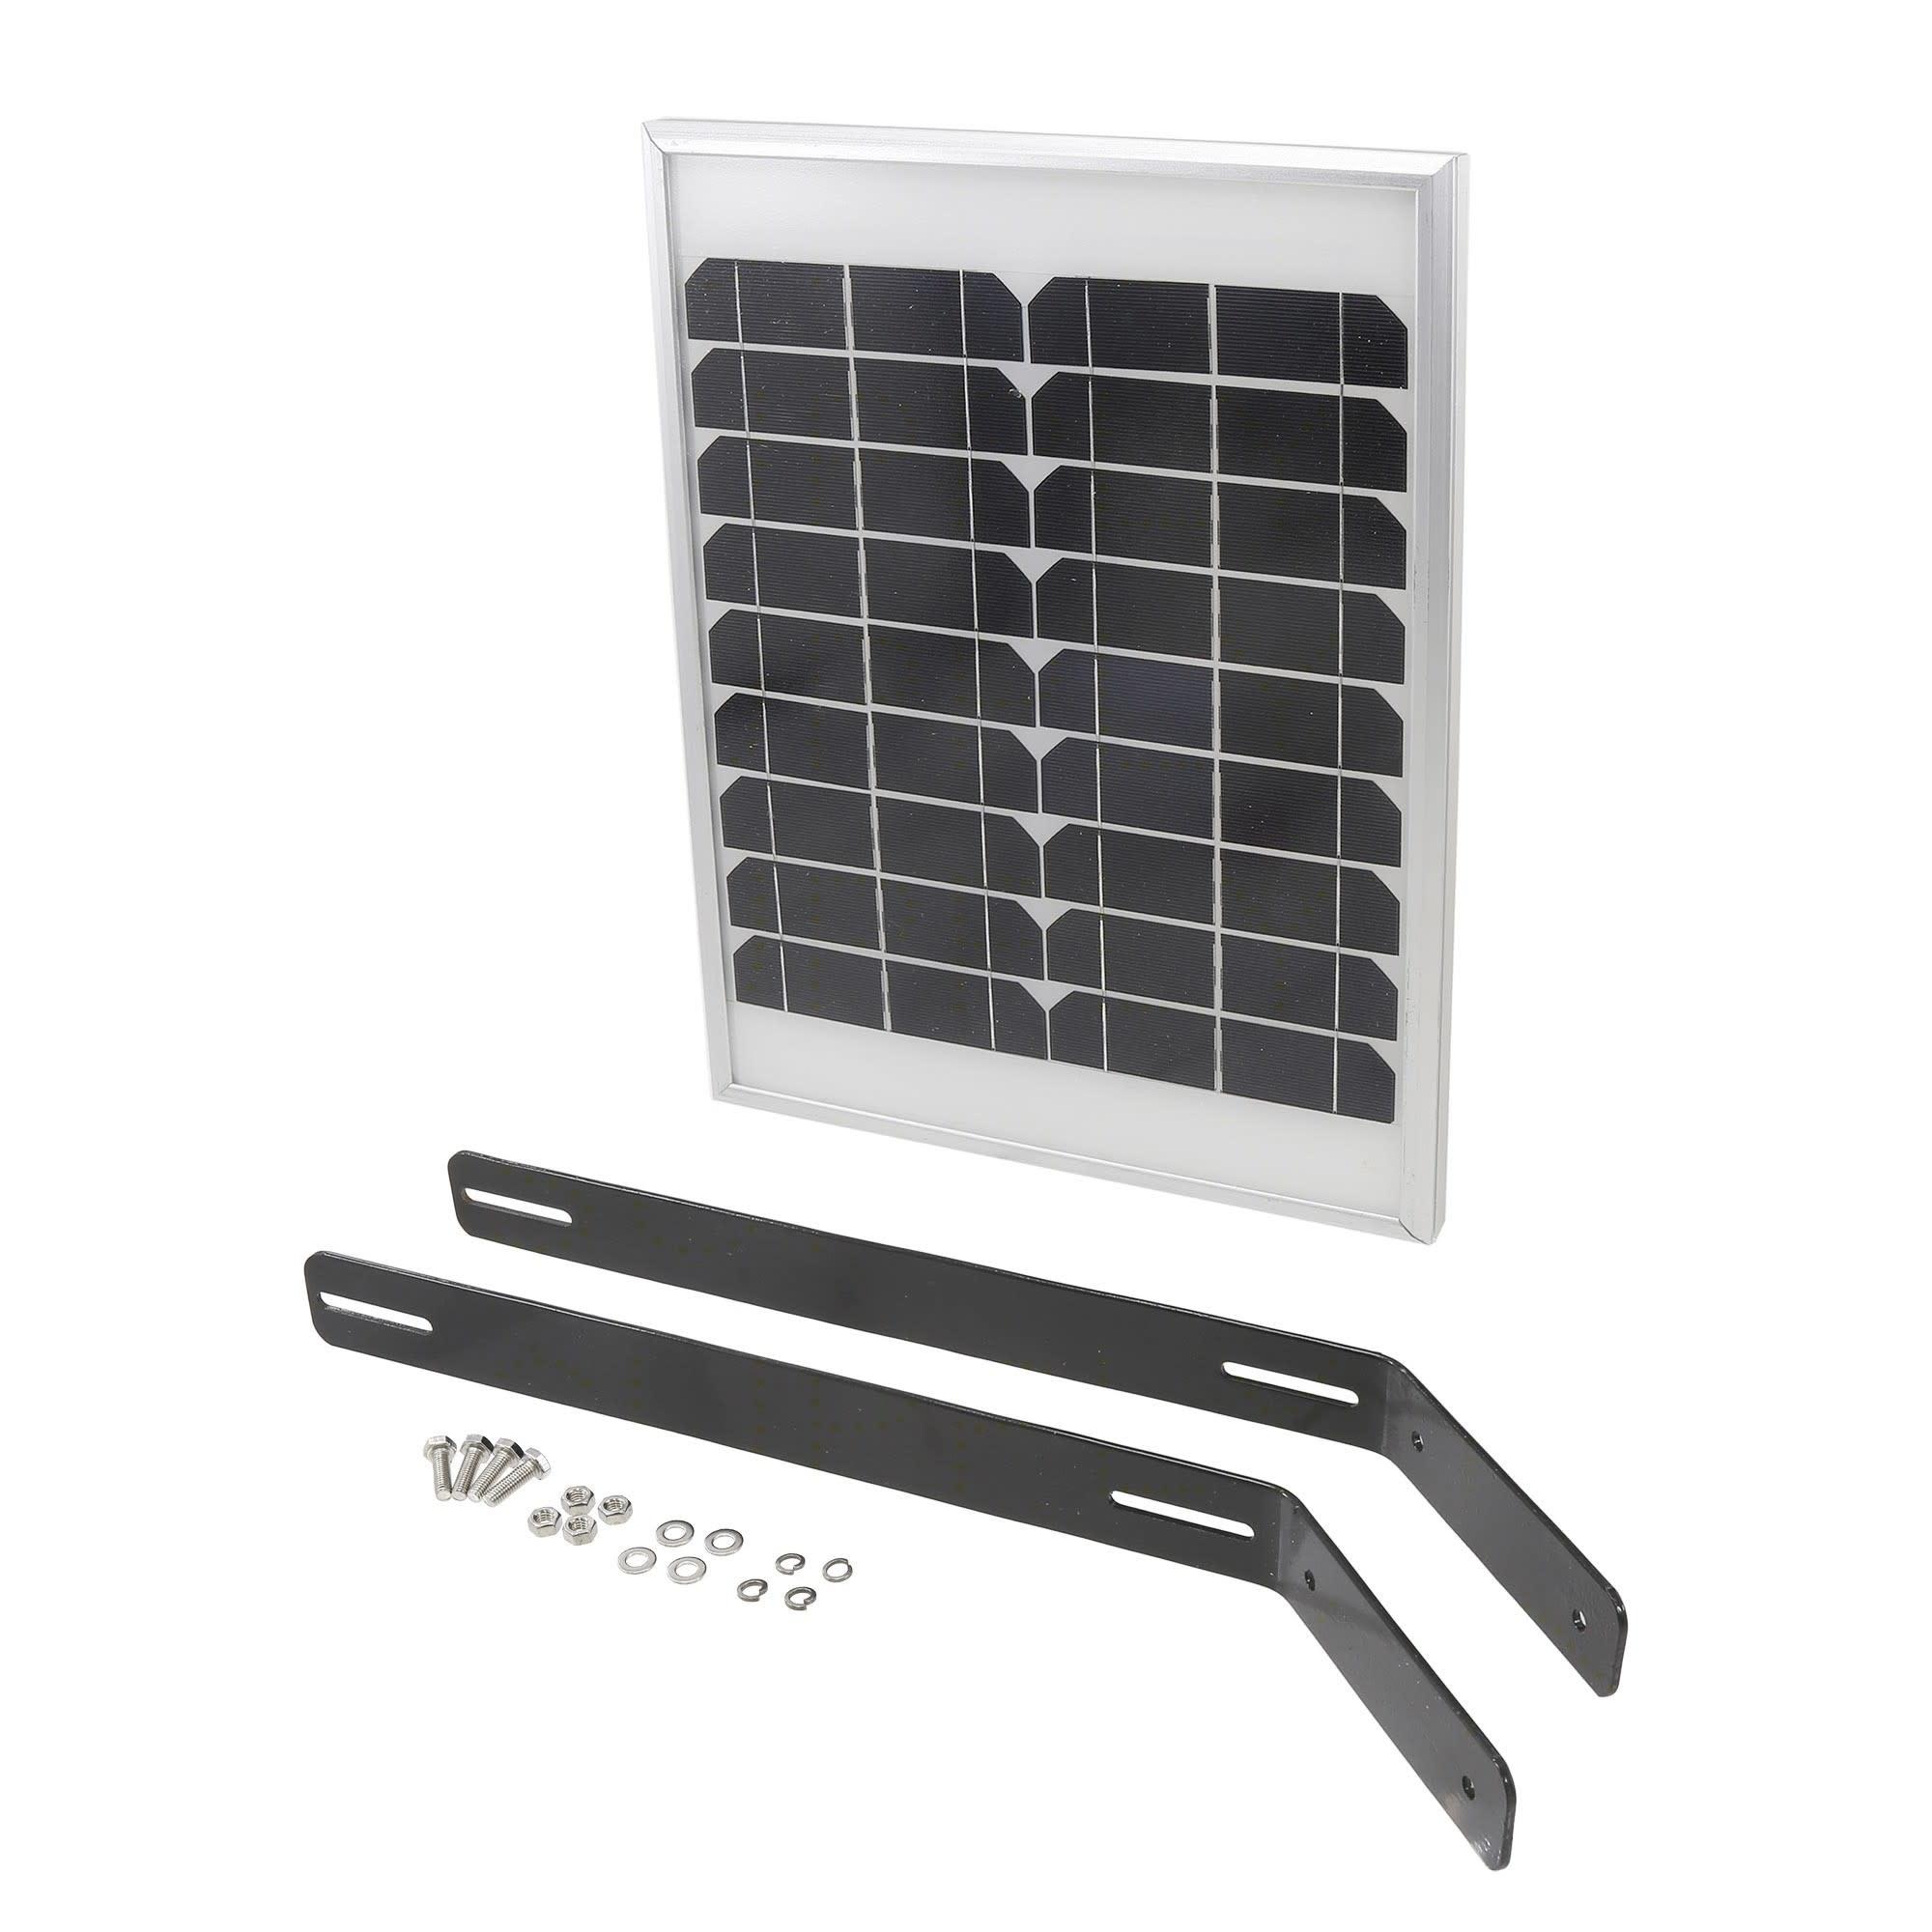 USAutomatic 20 watt Solar Panel Kit (with 15 feet cable, Dual Bracket & Plug)